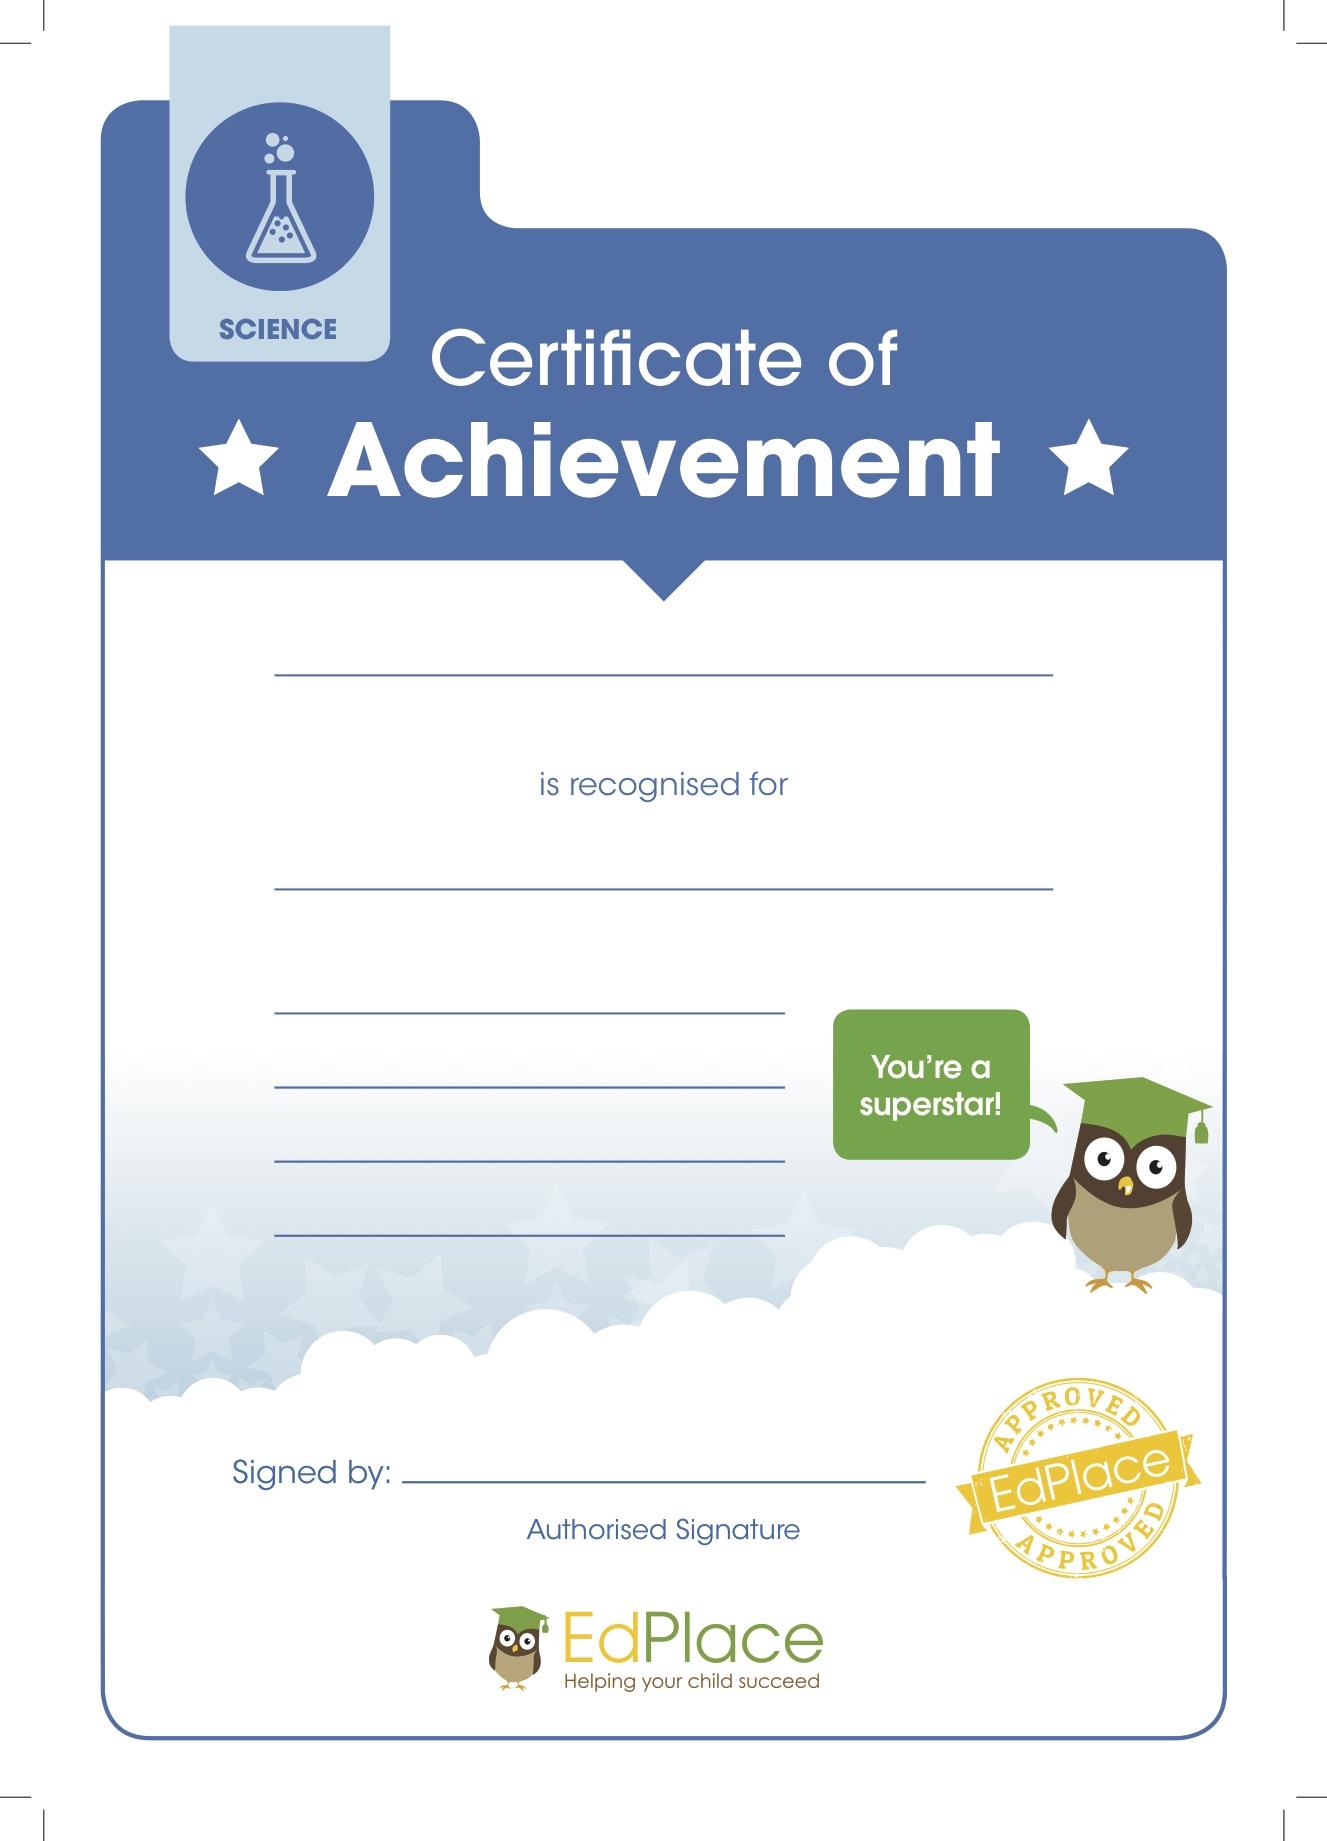 Science certificate